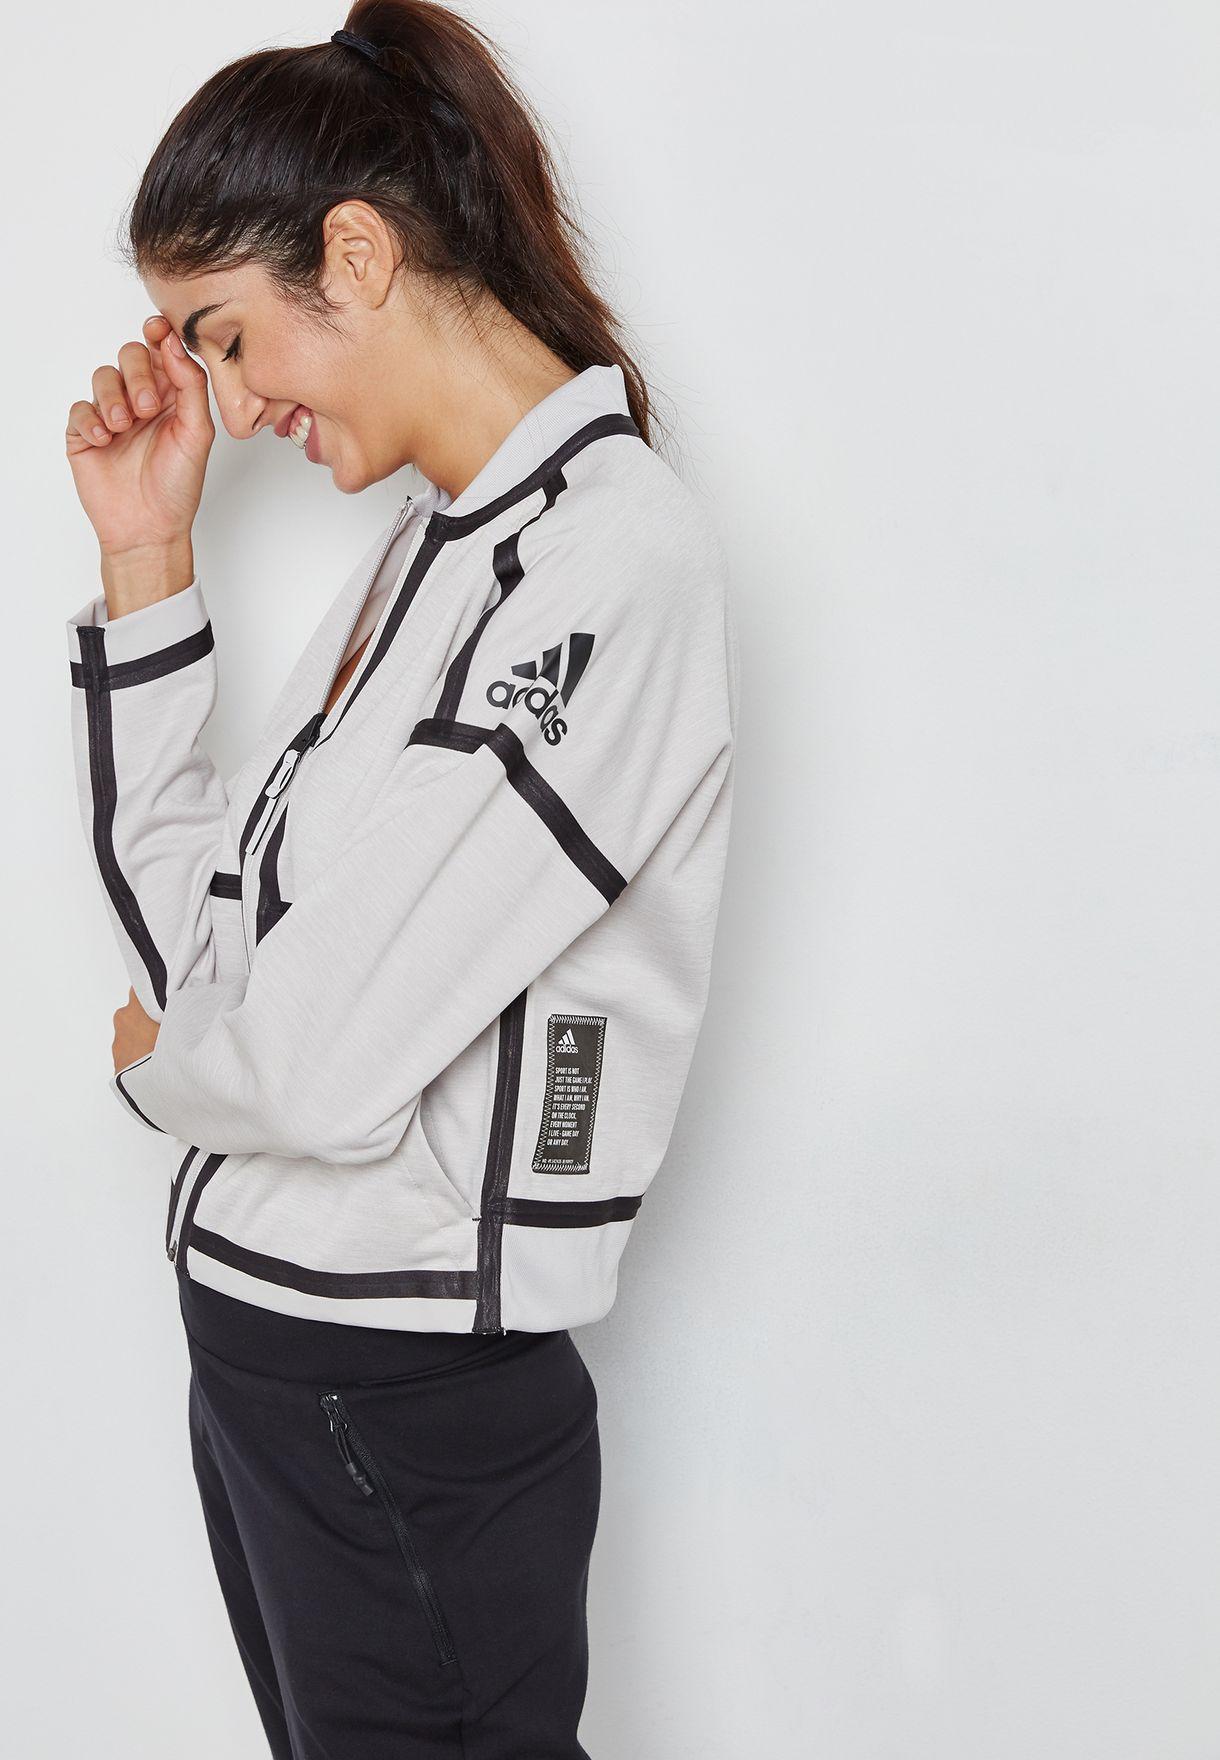 Claire Pinchazo móvil  Buy adidas multicolor Z.N.E Reversible Jacket for Women in MENA, Worldwide  | CF1465